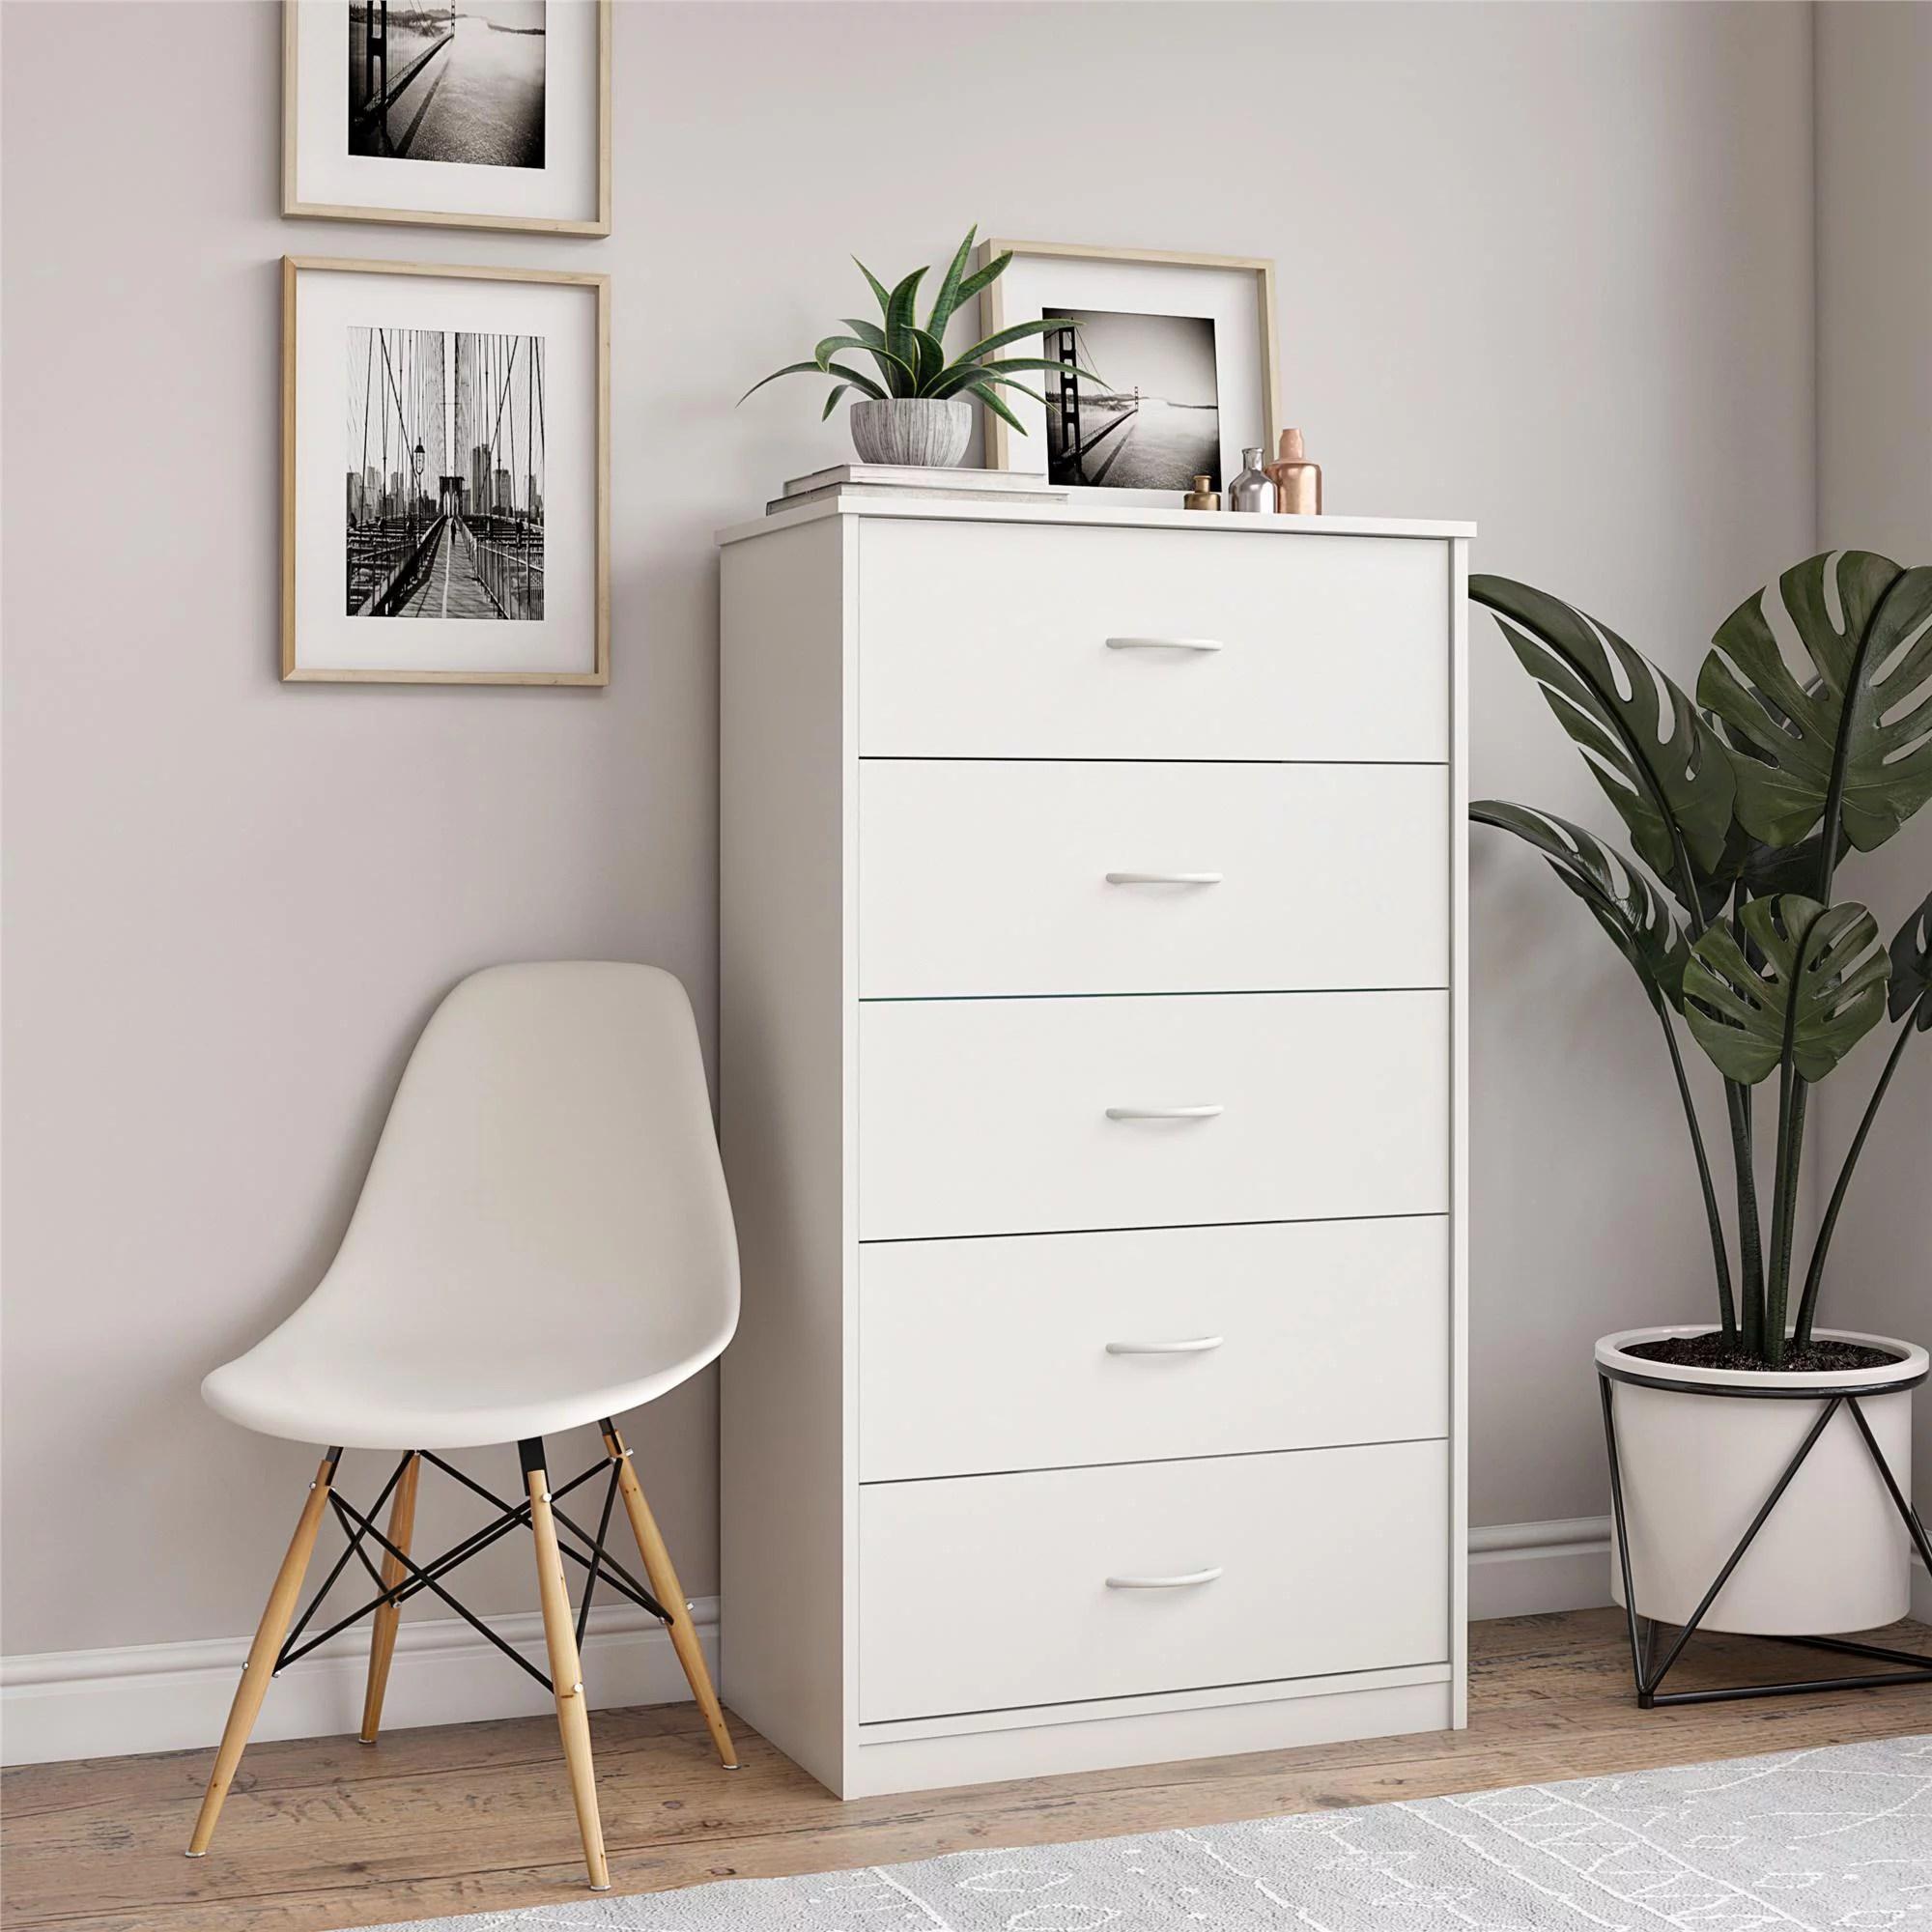 mainstays classic 5 drawer dresser white finish walmart com